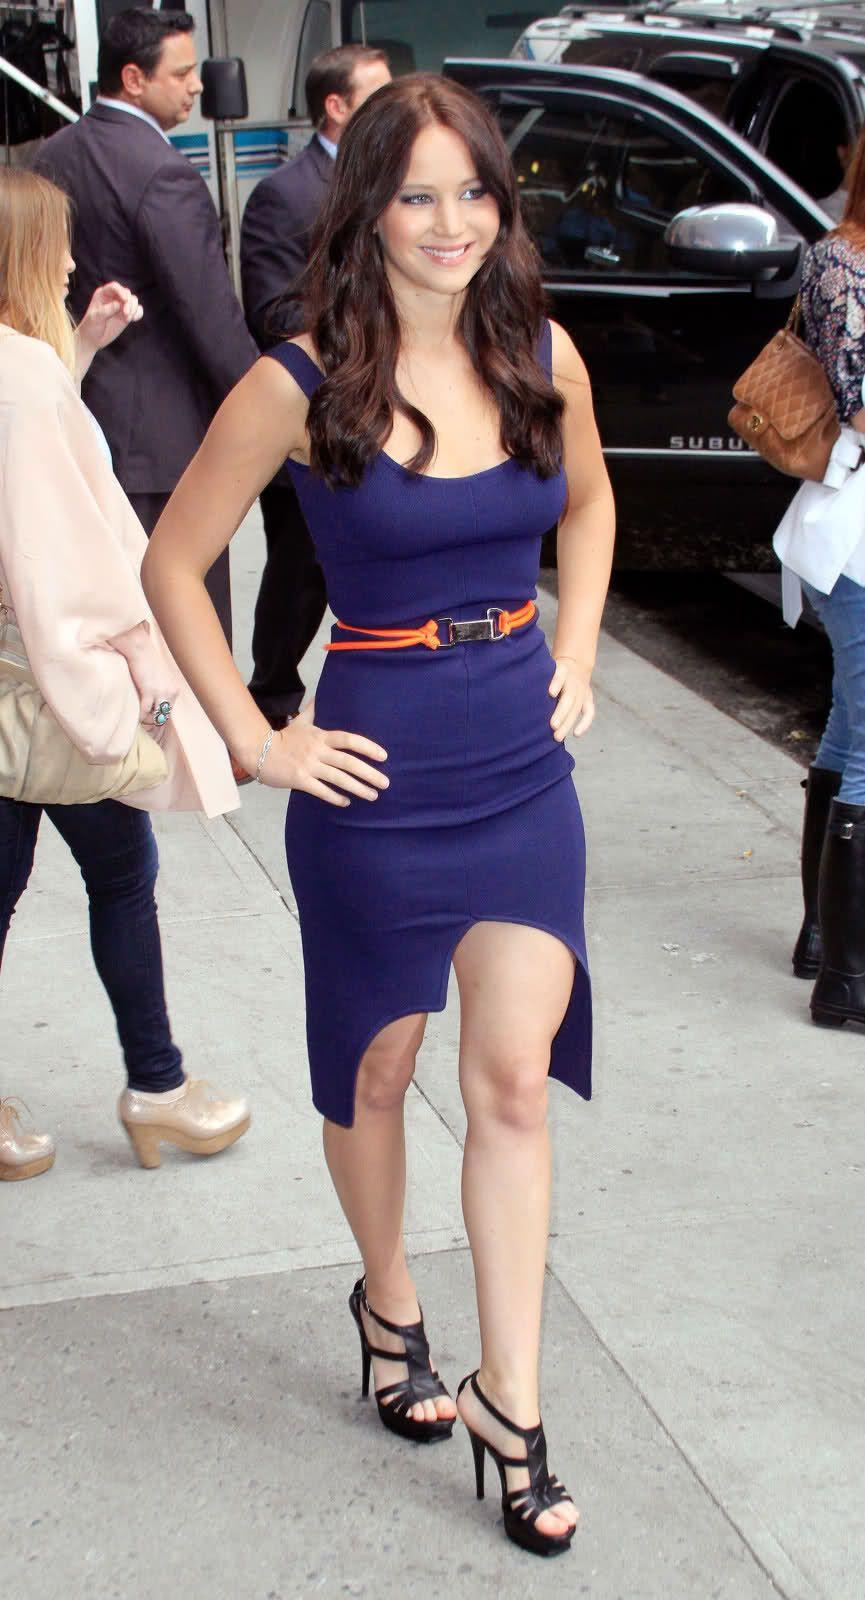 JENNIFER LAWRNECE LEGS PHOTOS | Thread: Jennifer Lawrence Flashing ...